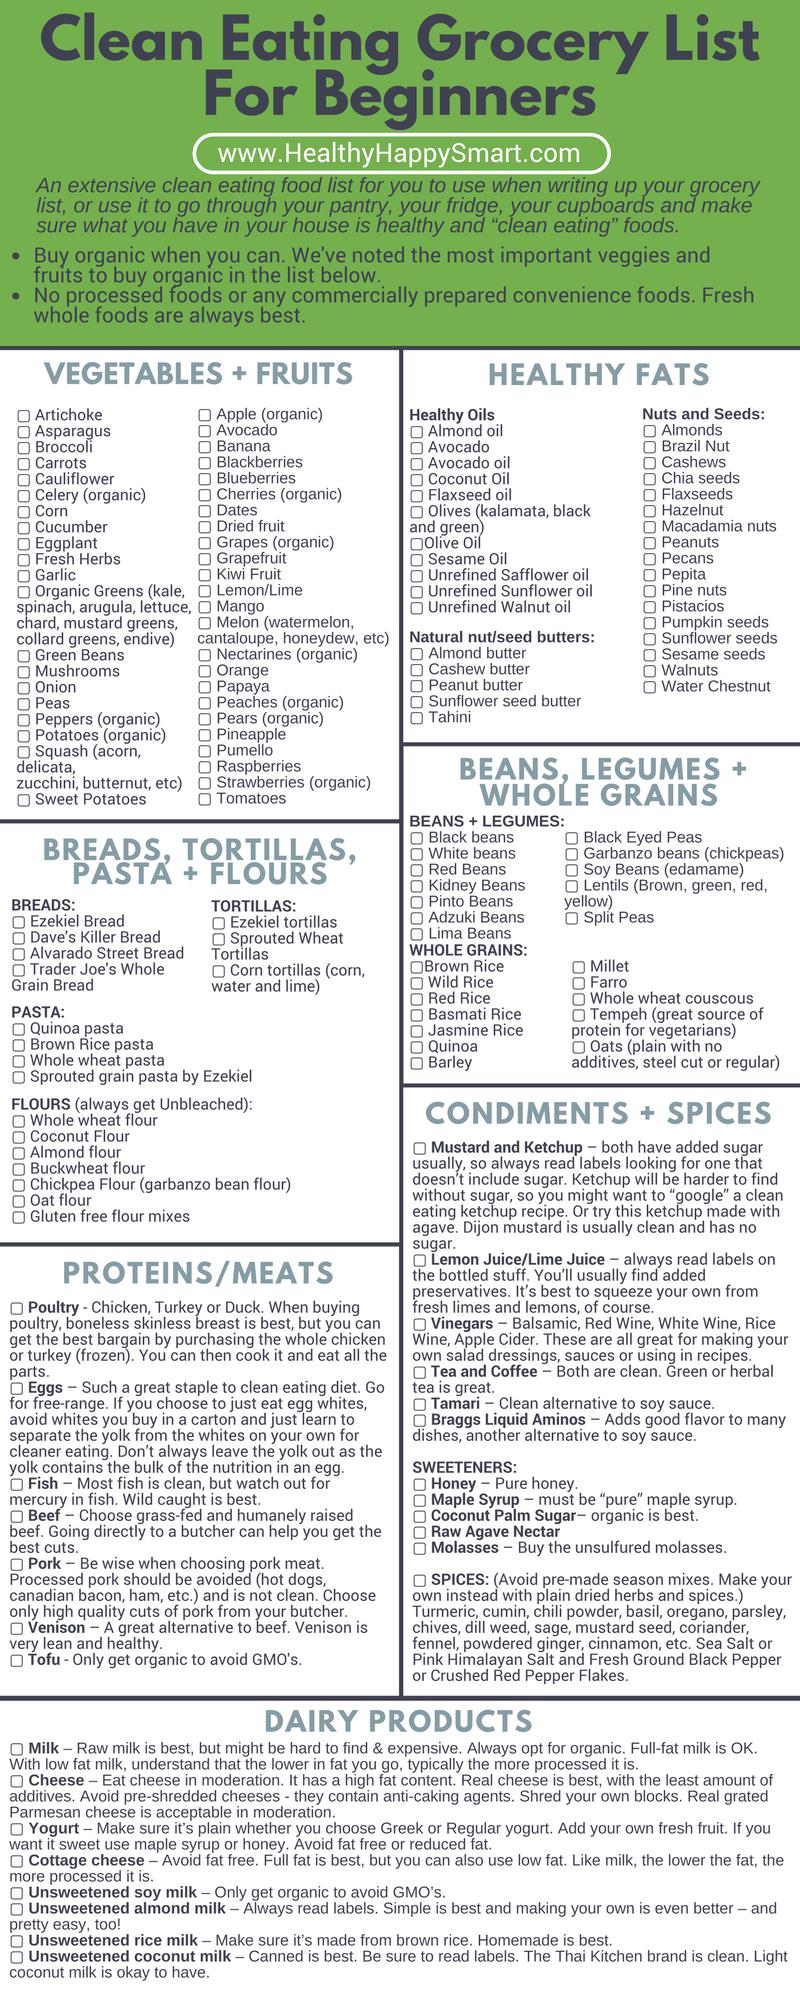 Clean Eating Grocery List • Healthy Food List • Healthy.happy.smart. - Free Printable Clean Eating Grocery List